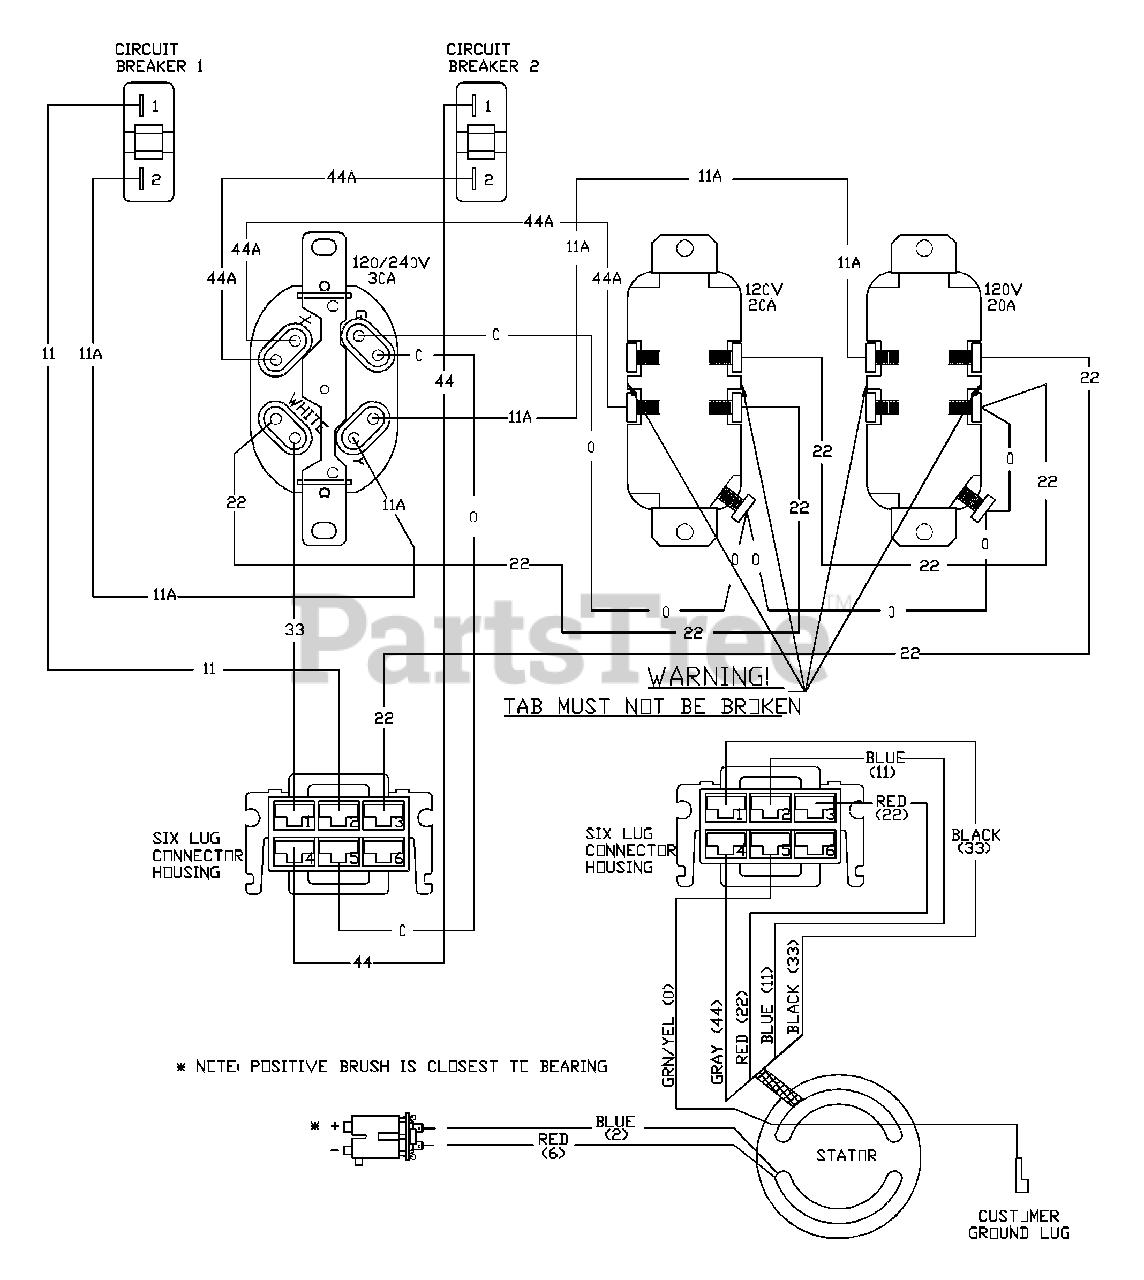 [XOTG_4463]  Snapper 030215-0 - Snapper 5,600 Watt Portable Generator Wiring Diagram  (190536) Parts Lookup with Diagrams   PartsTree   Portable Generators Repair Wiring Diagram      PartsTree